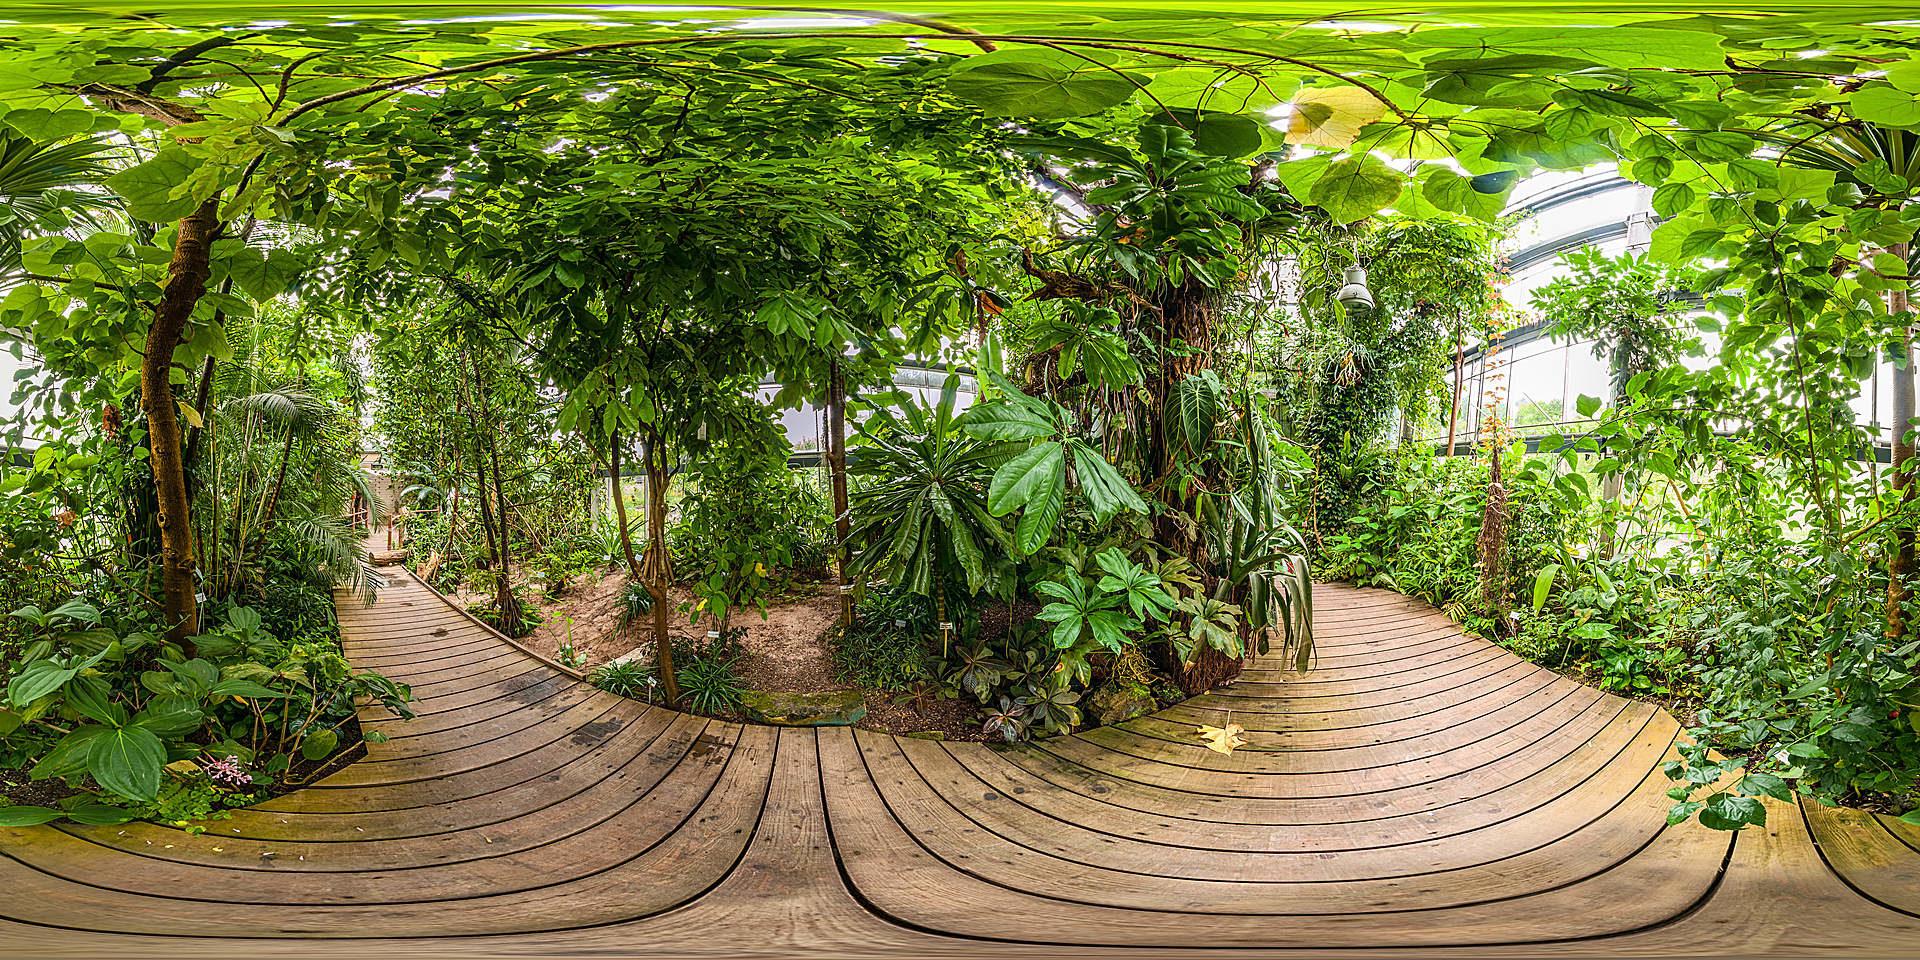 botanischer garten w rzburg tropenschauhaus tieflandregenwald panorama fotos. Black Bedroom Furniture Sets. Home Design Ideas